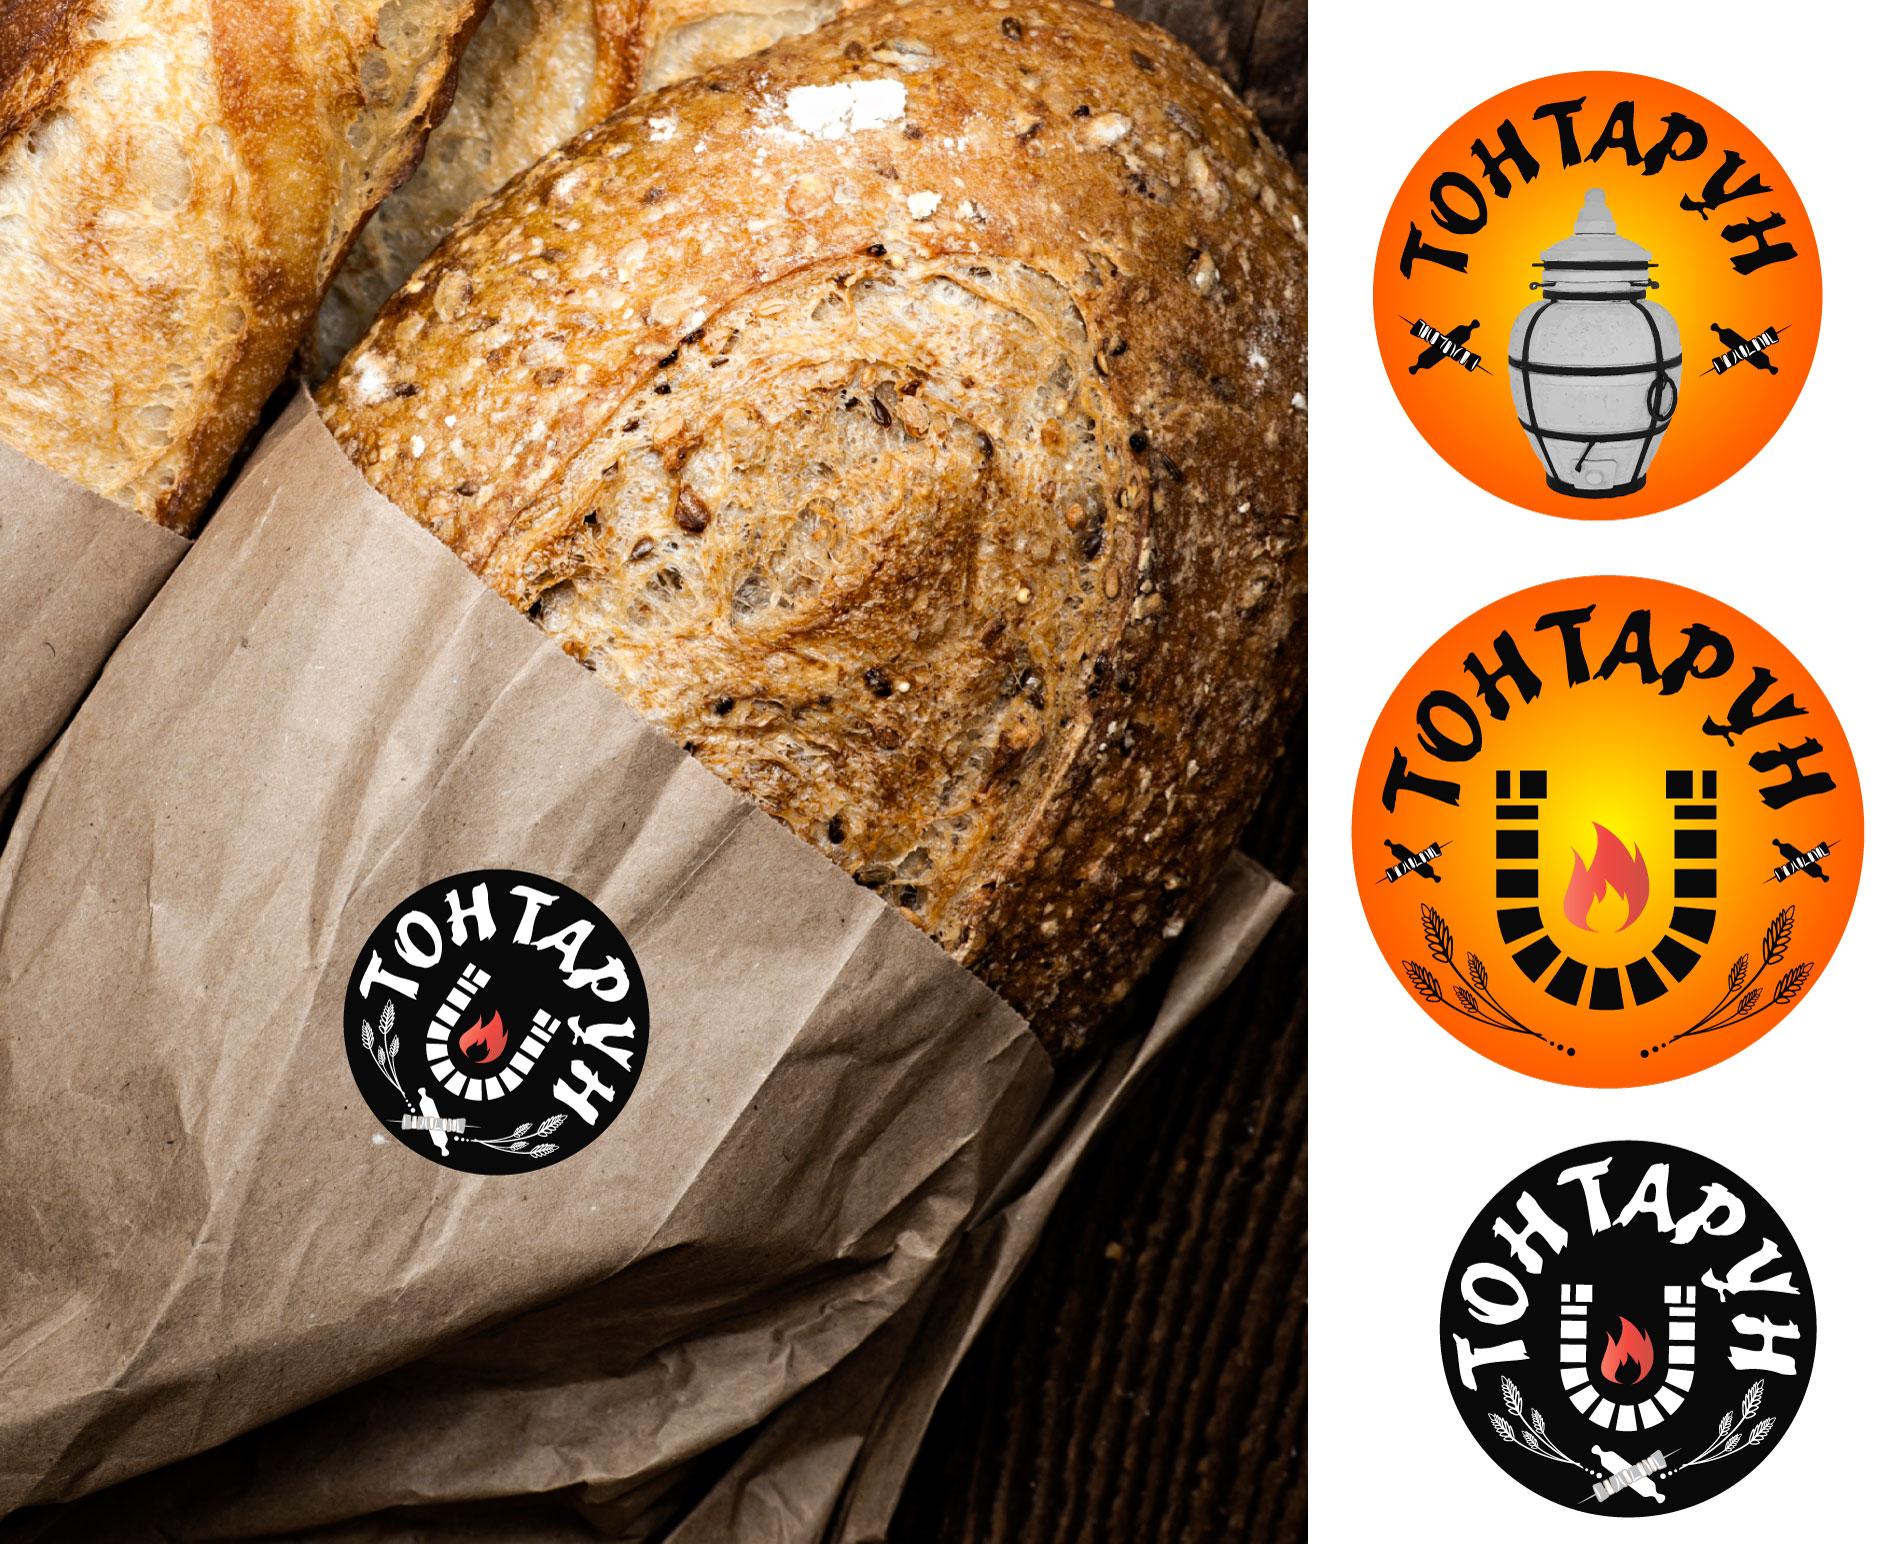 Логотип для Пекарни-Тандырной  фото f_8305d90a90ea3add.jpg